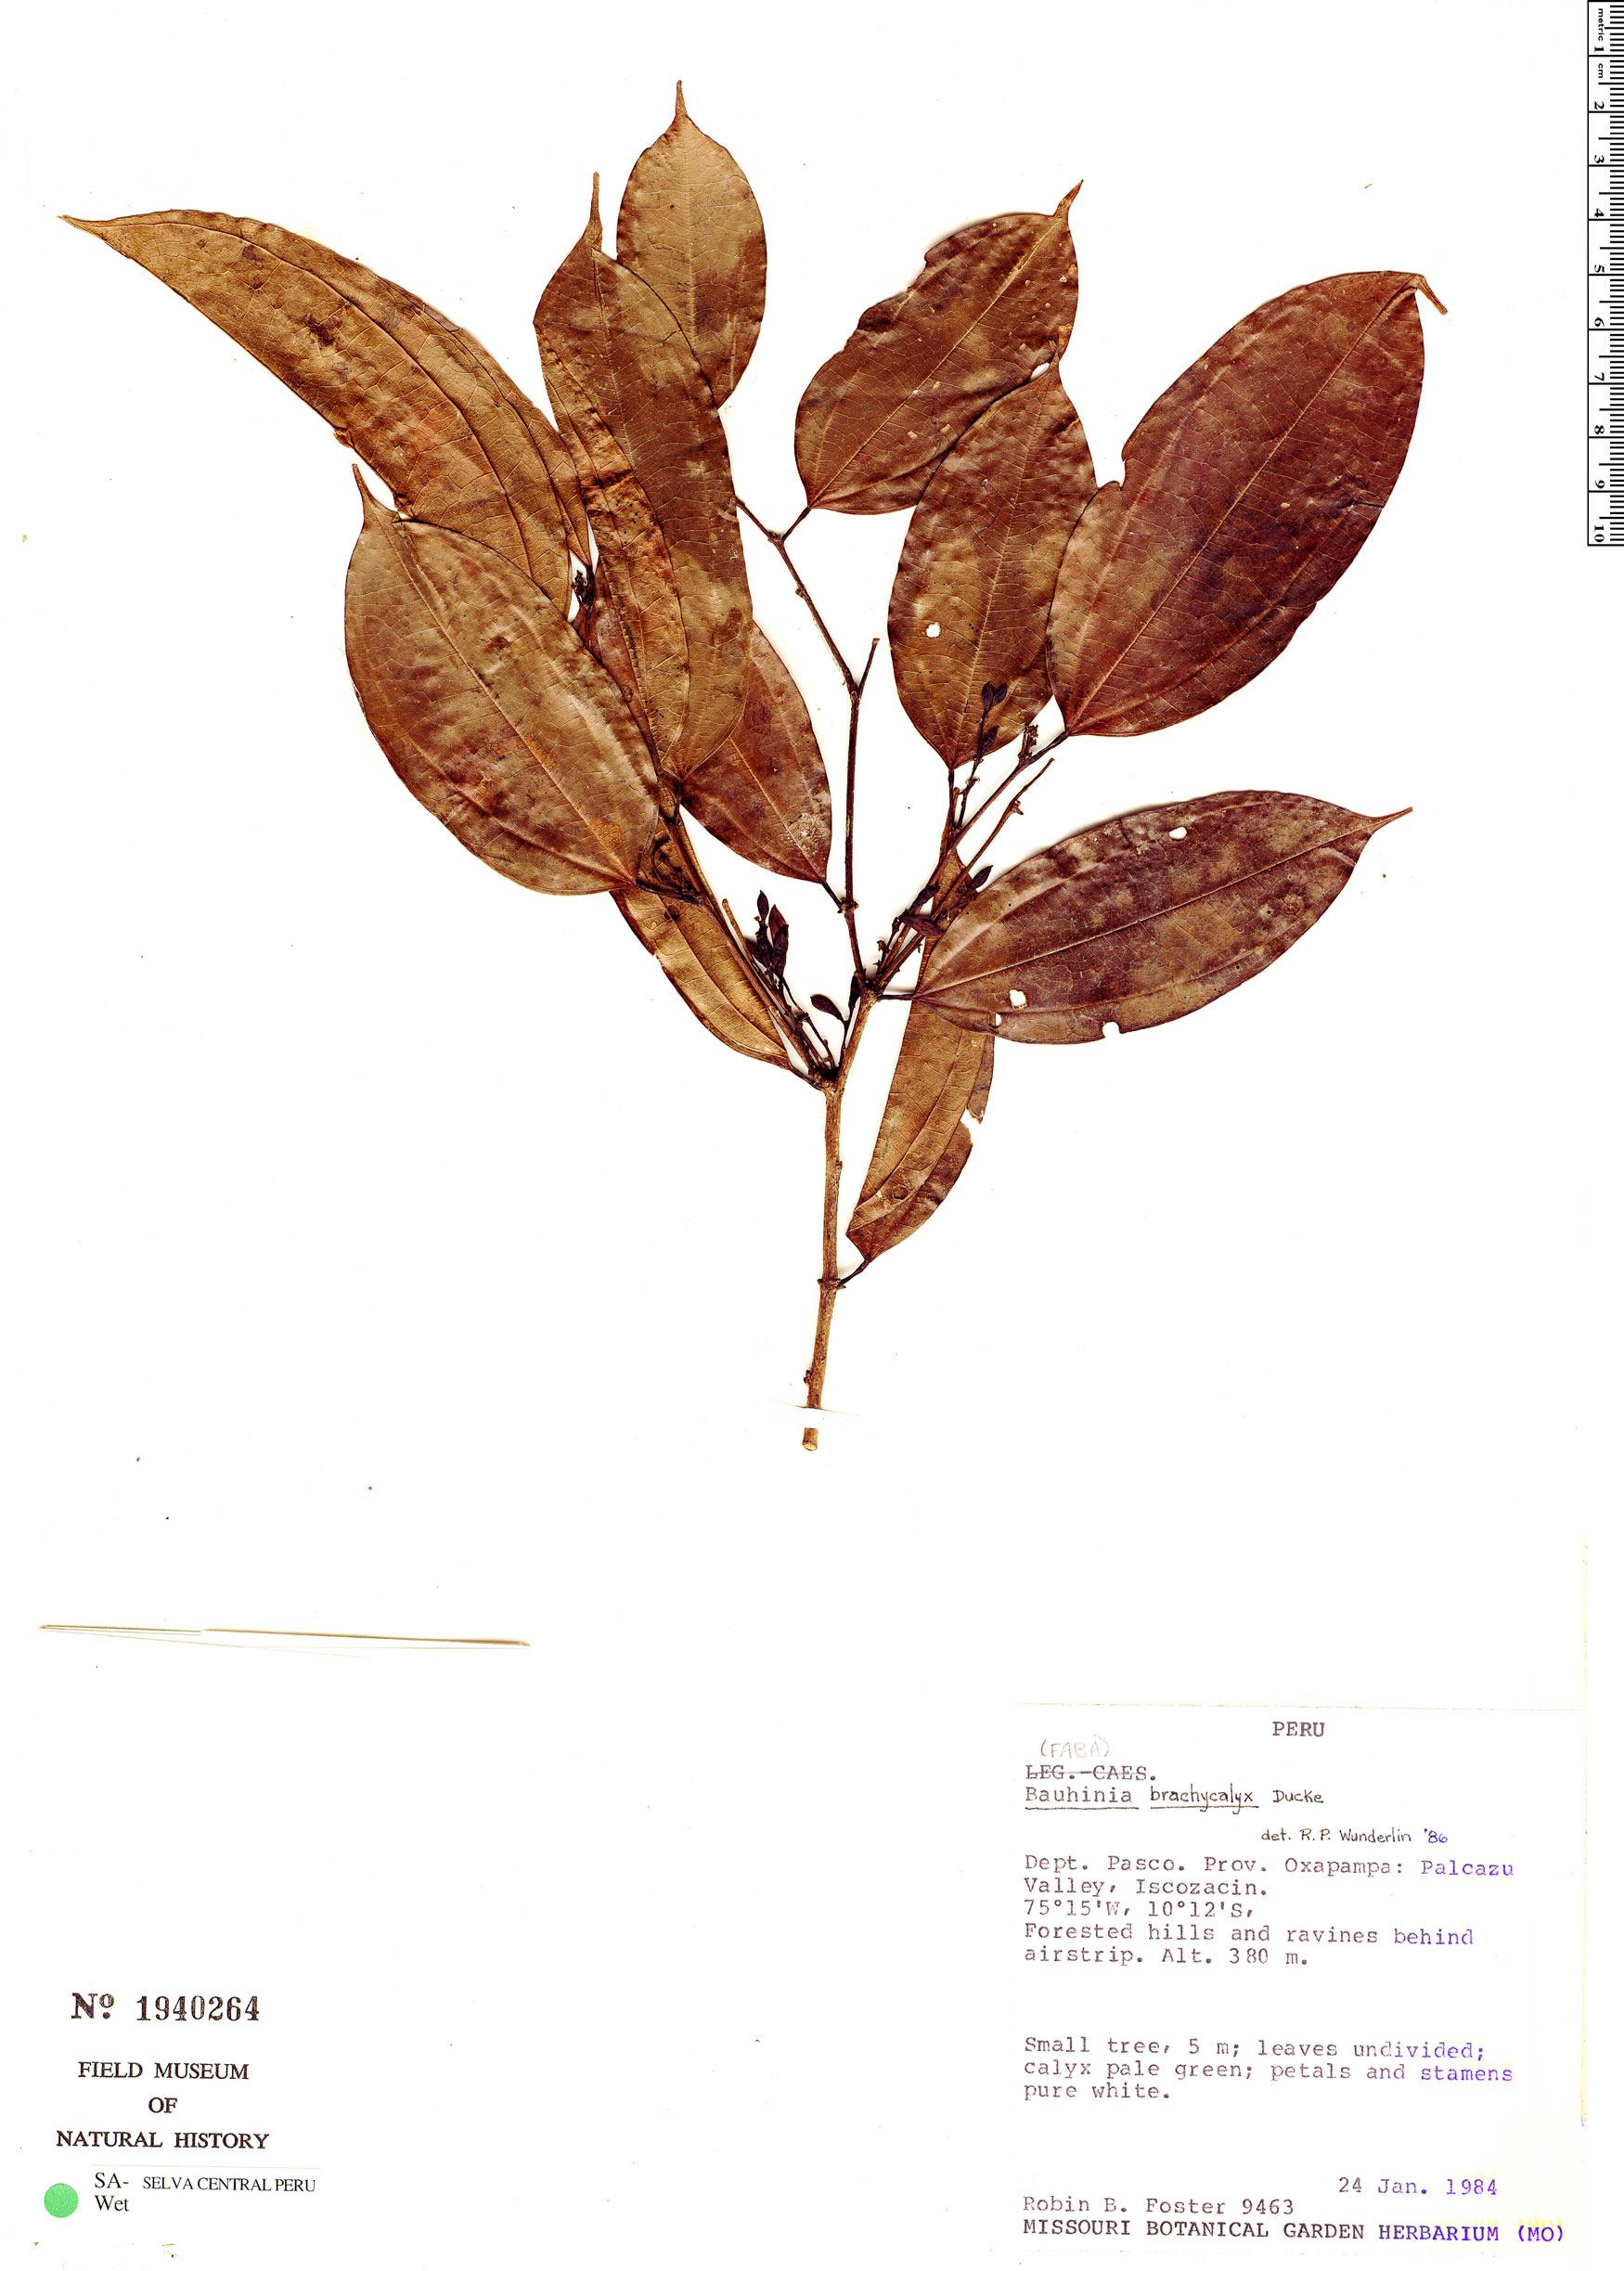 Specimen: Bauhinia brachycalyx